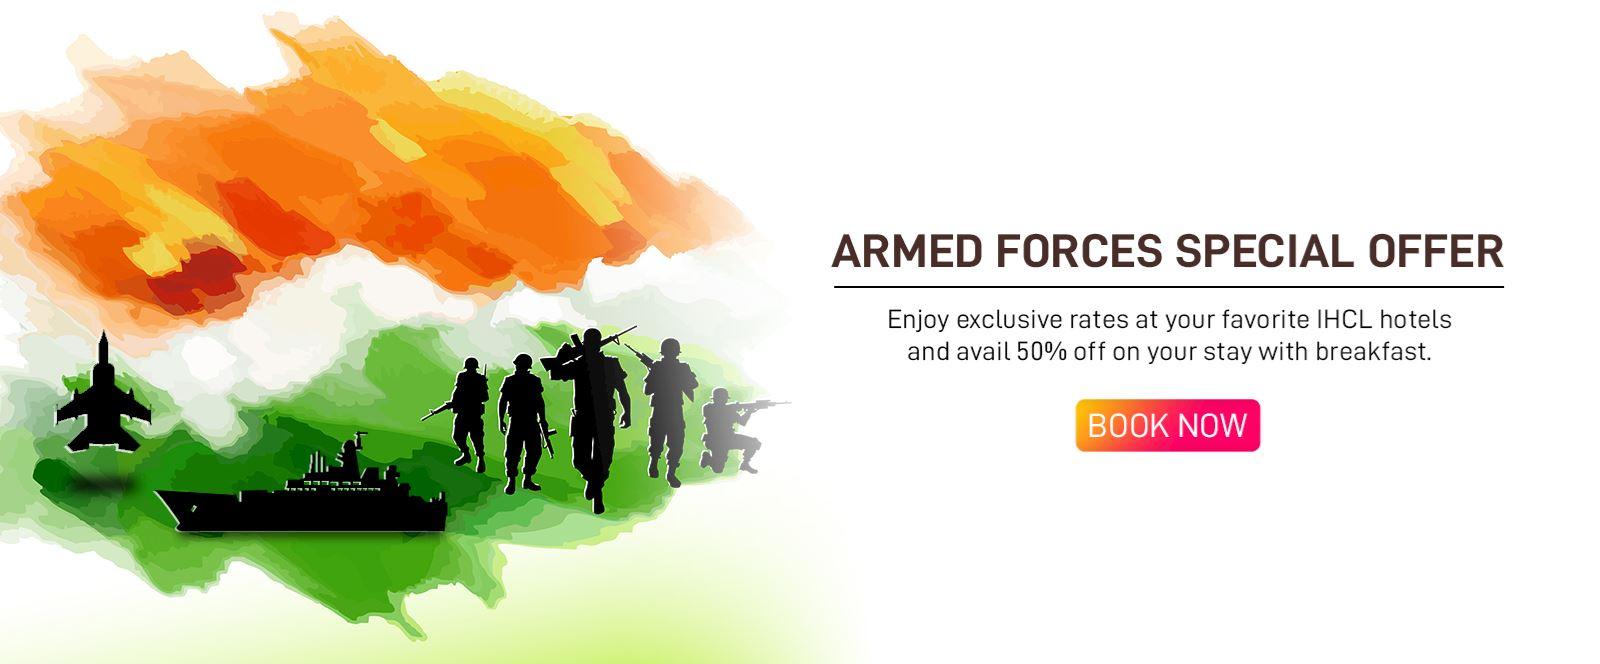 Armed Forces Offer